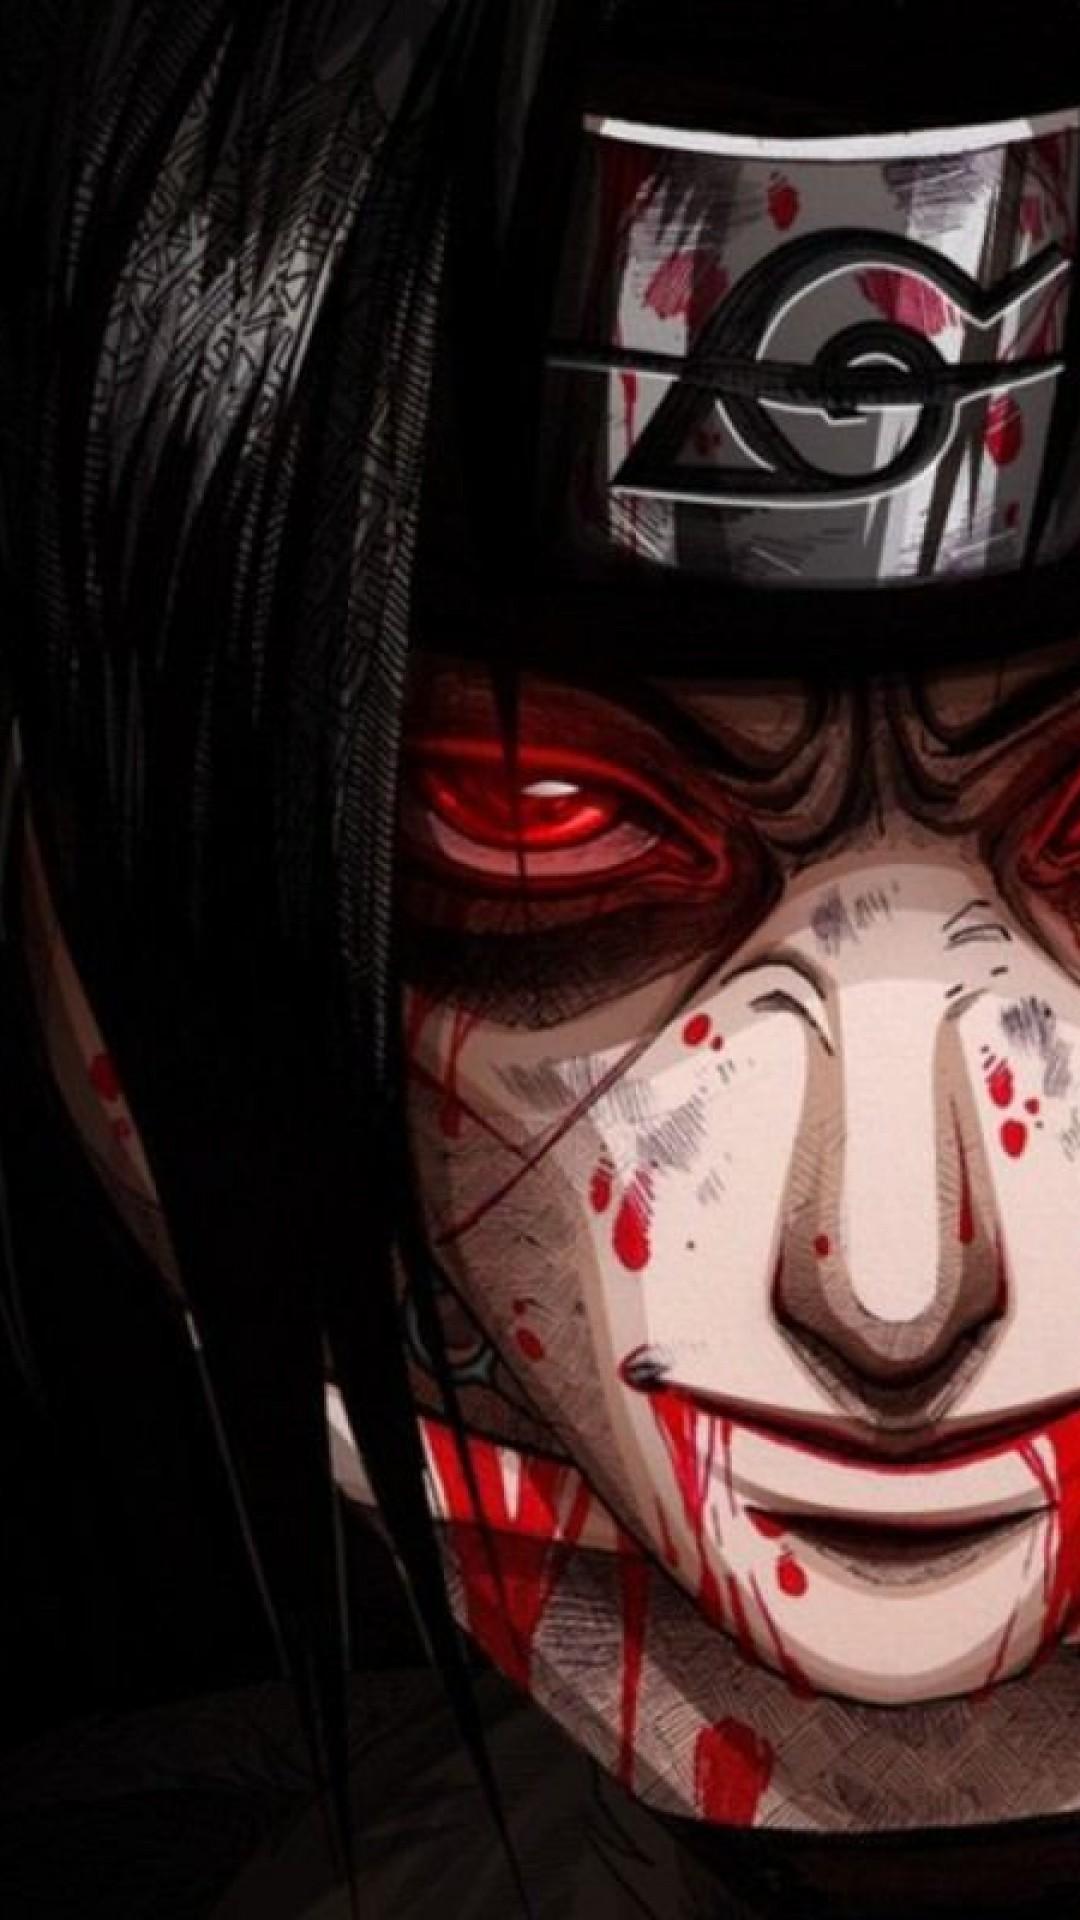 Sai Naruto Wallpaper for Desktop and Mobiles iPhone 6 6S